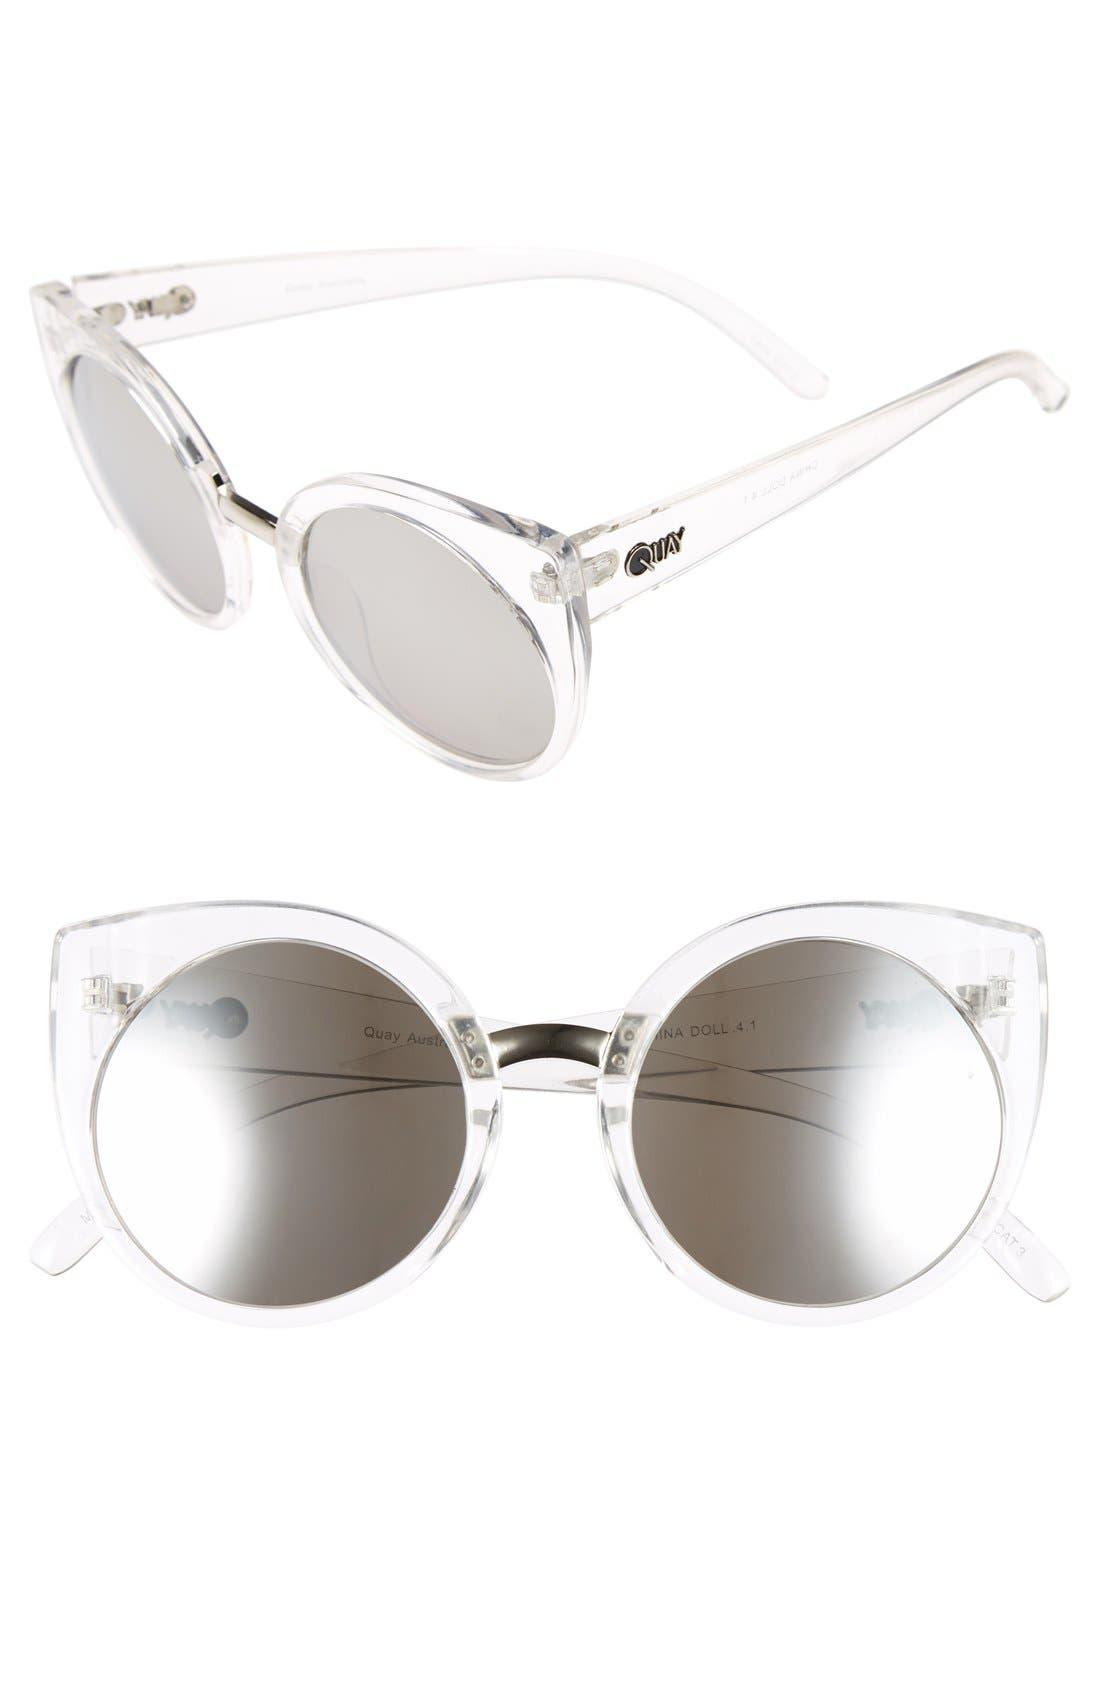 Alternate Image 1 Selected - Quay Australia 'China Doll' 55mm Translucent Cat Eye Sunglasses